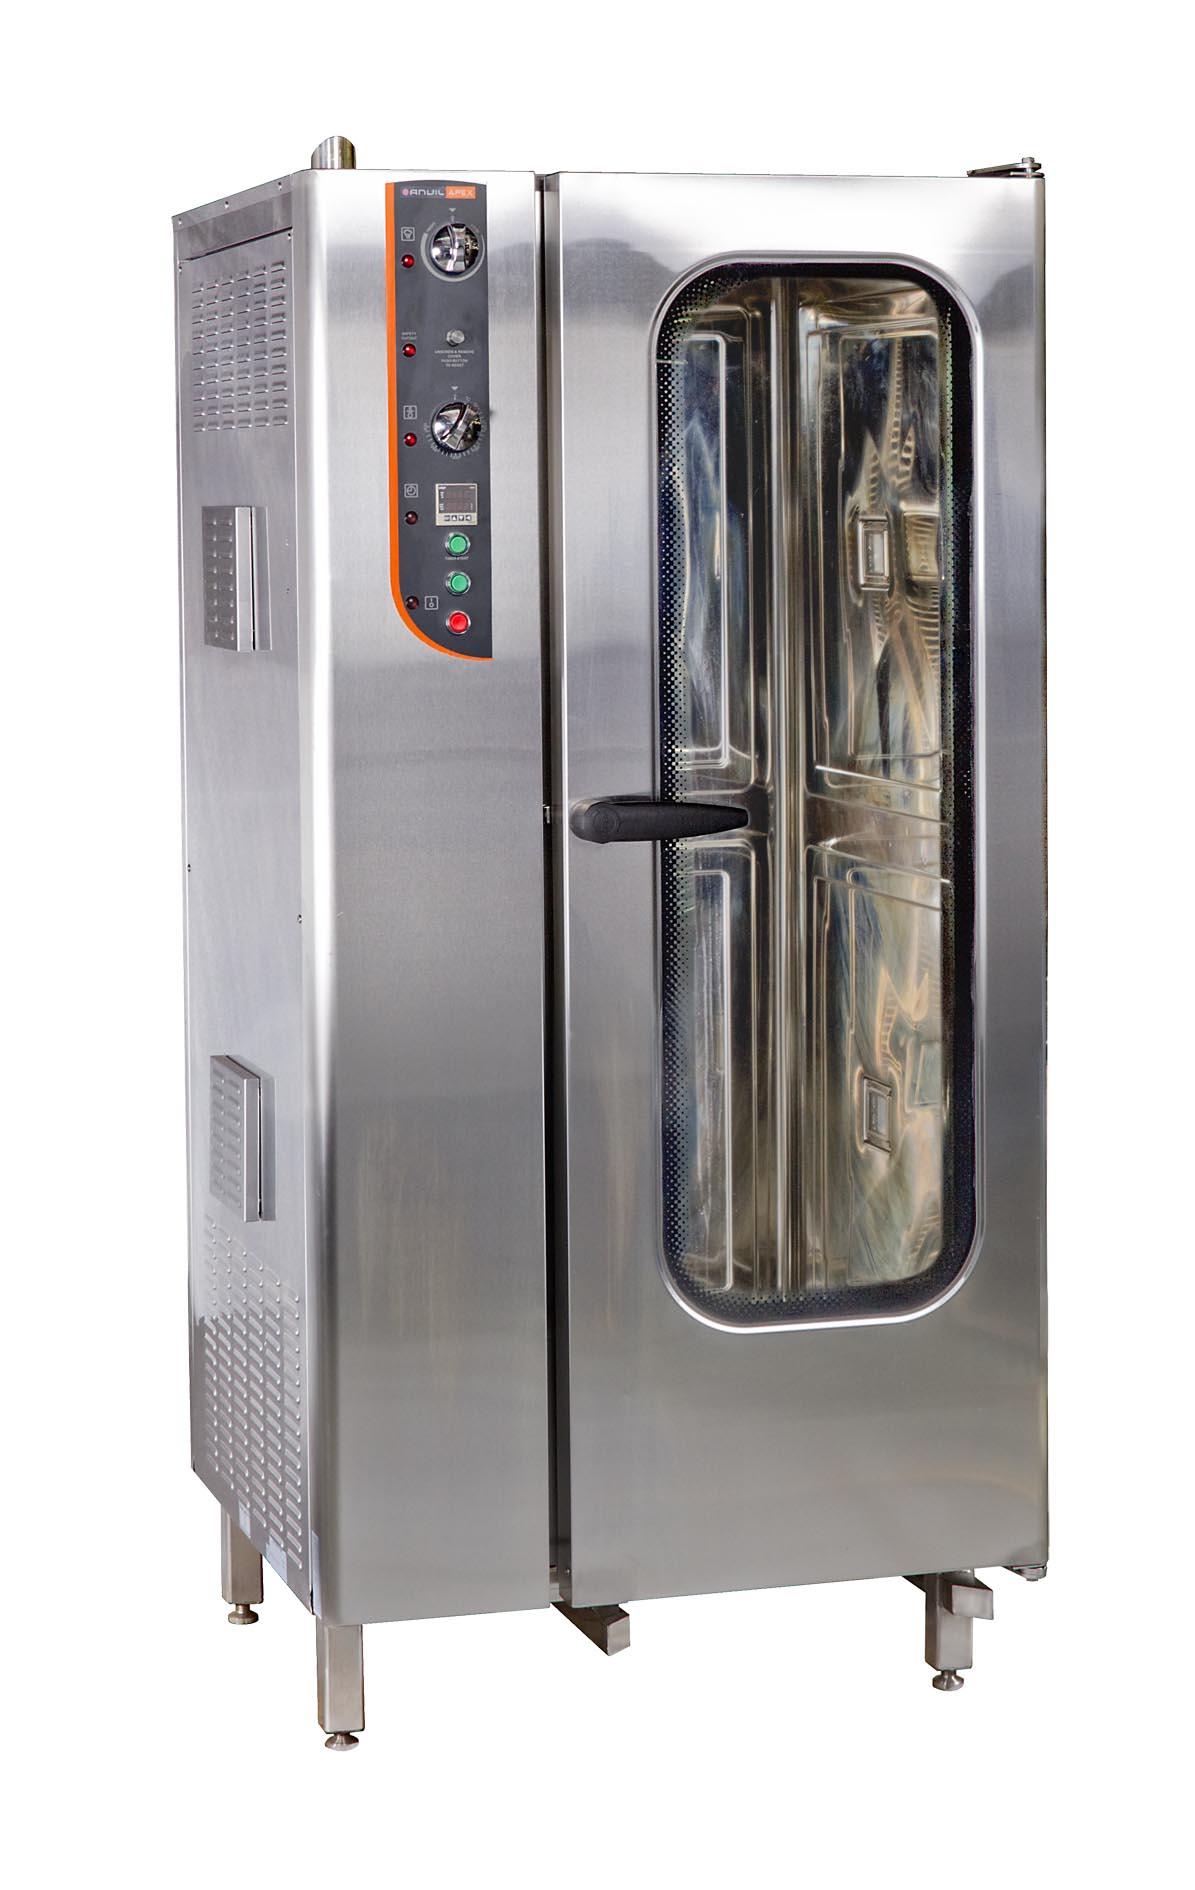 coa1020--convection-oven-anvil-combi--20-pan